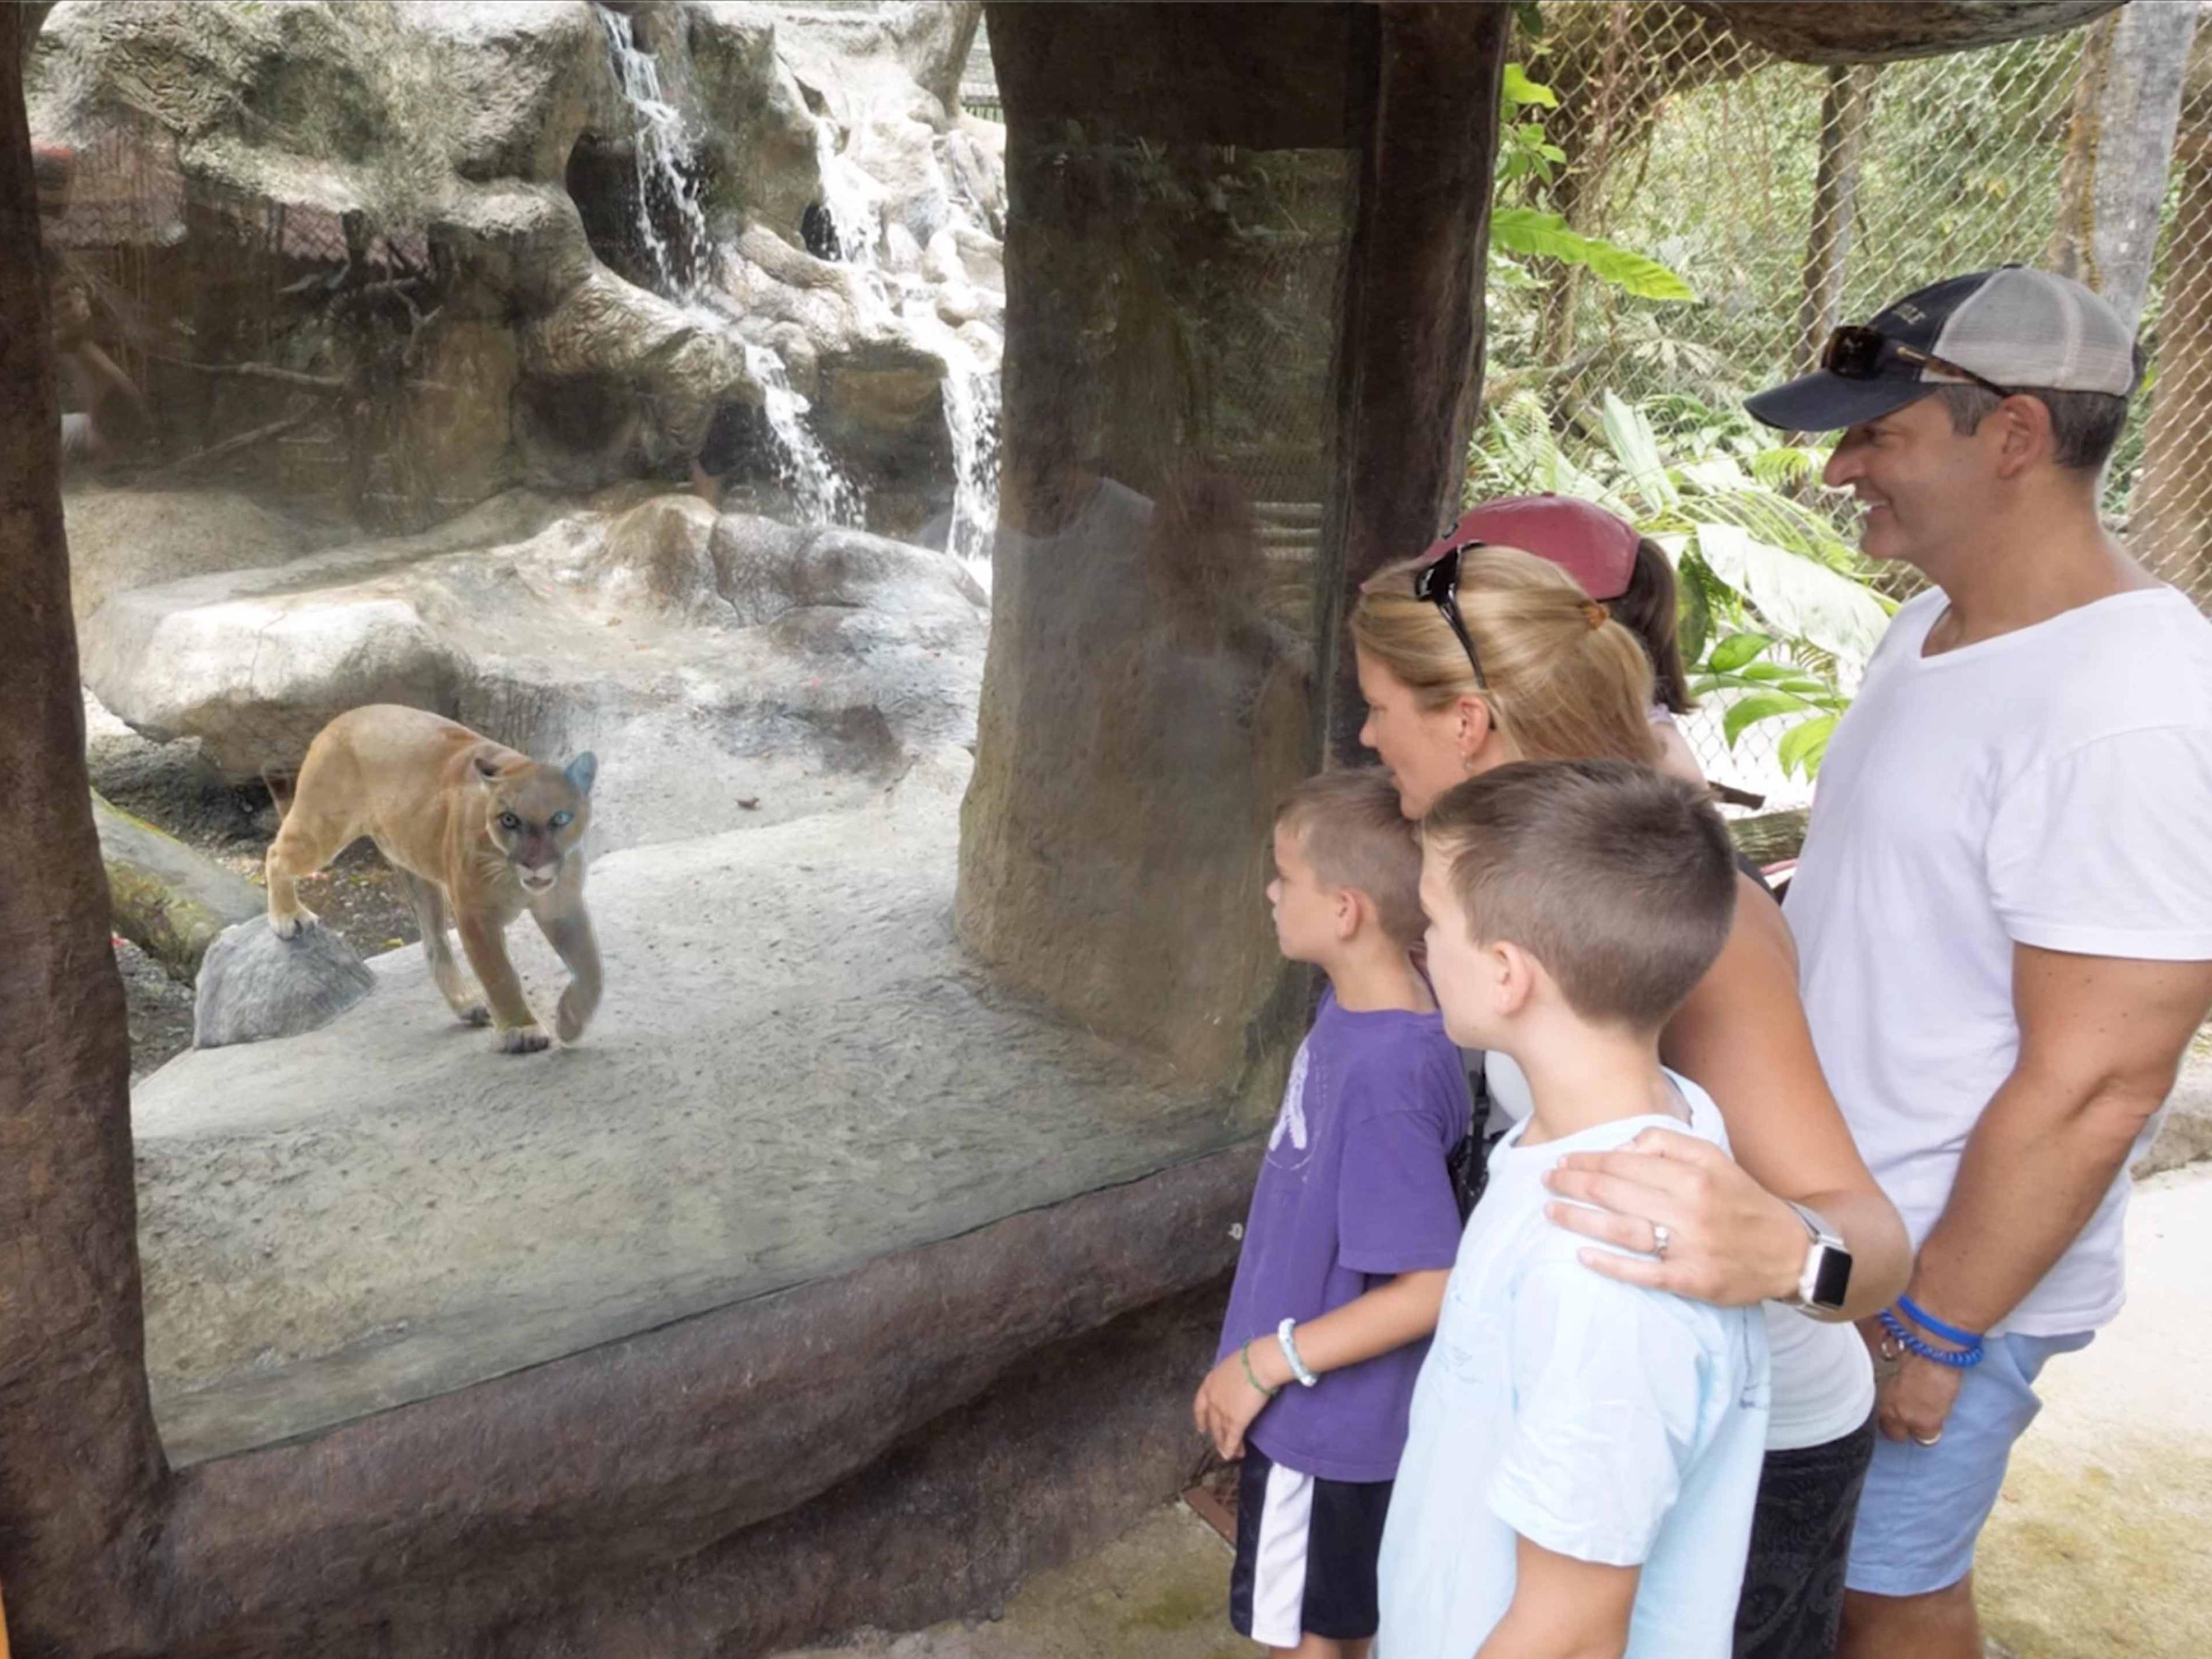 family looking at puma inside its habitat